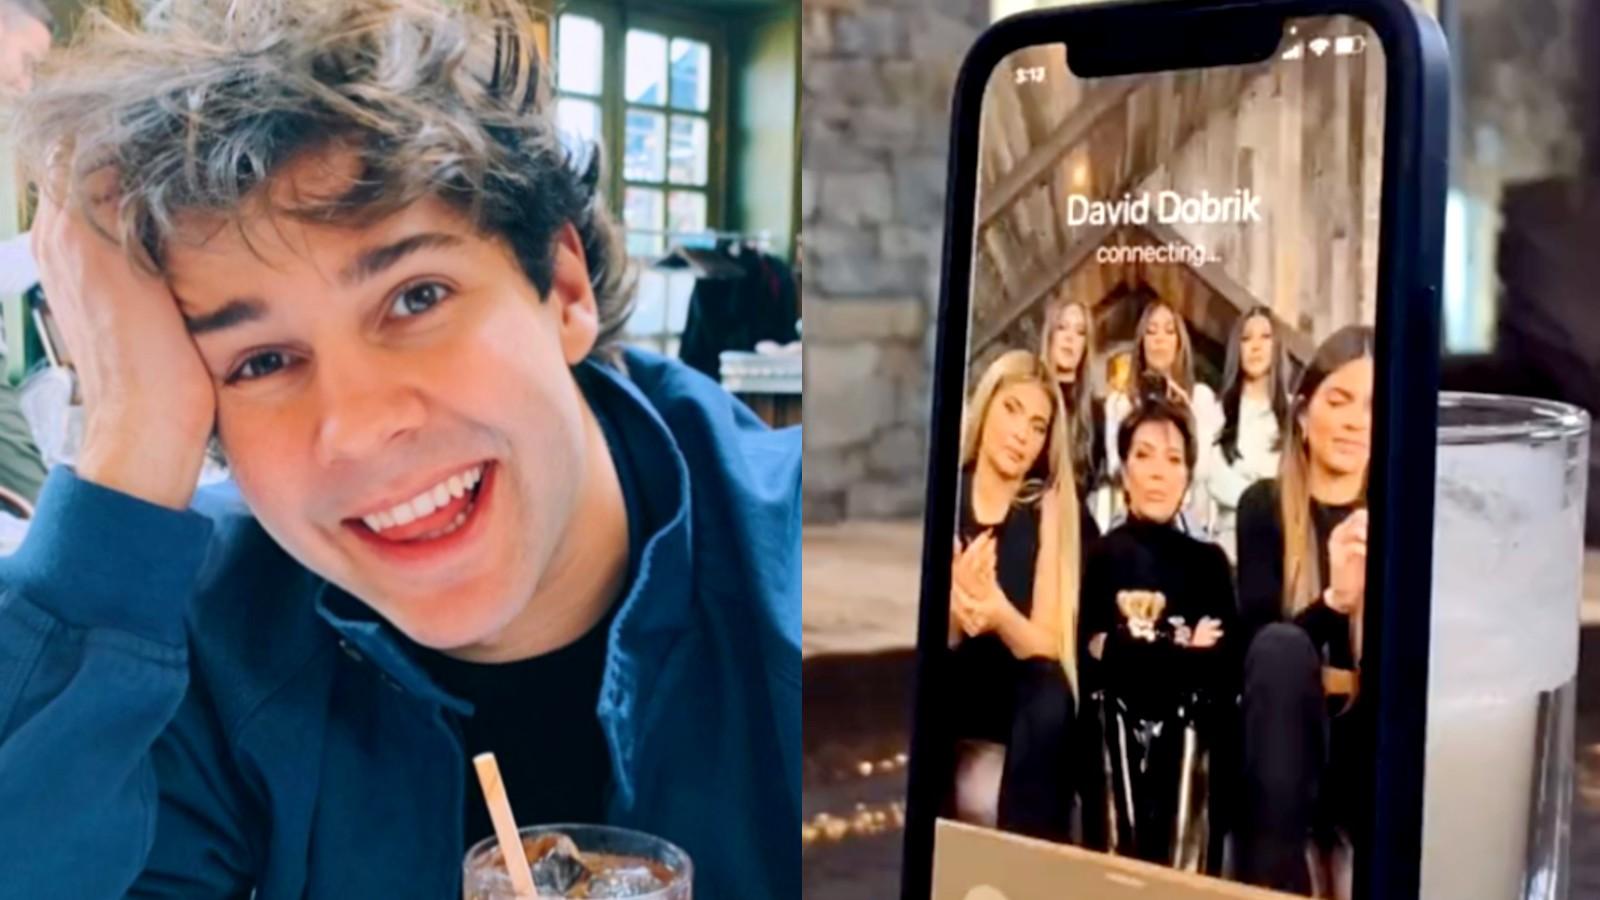 David Dobrik next to an image of the Kardashian family inside a phone